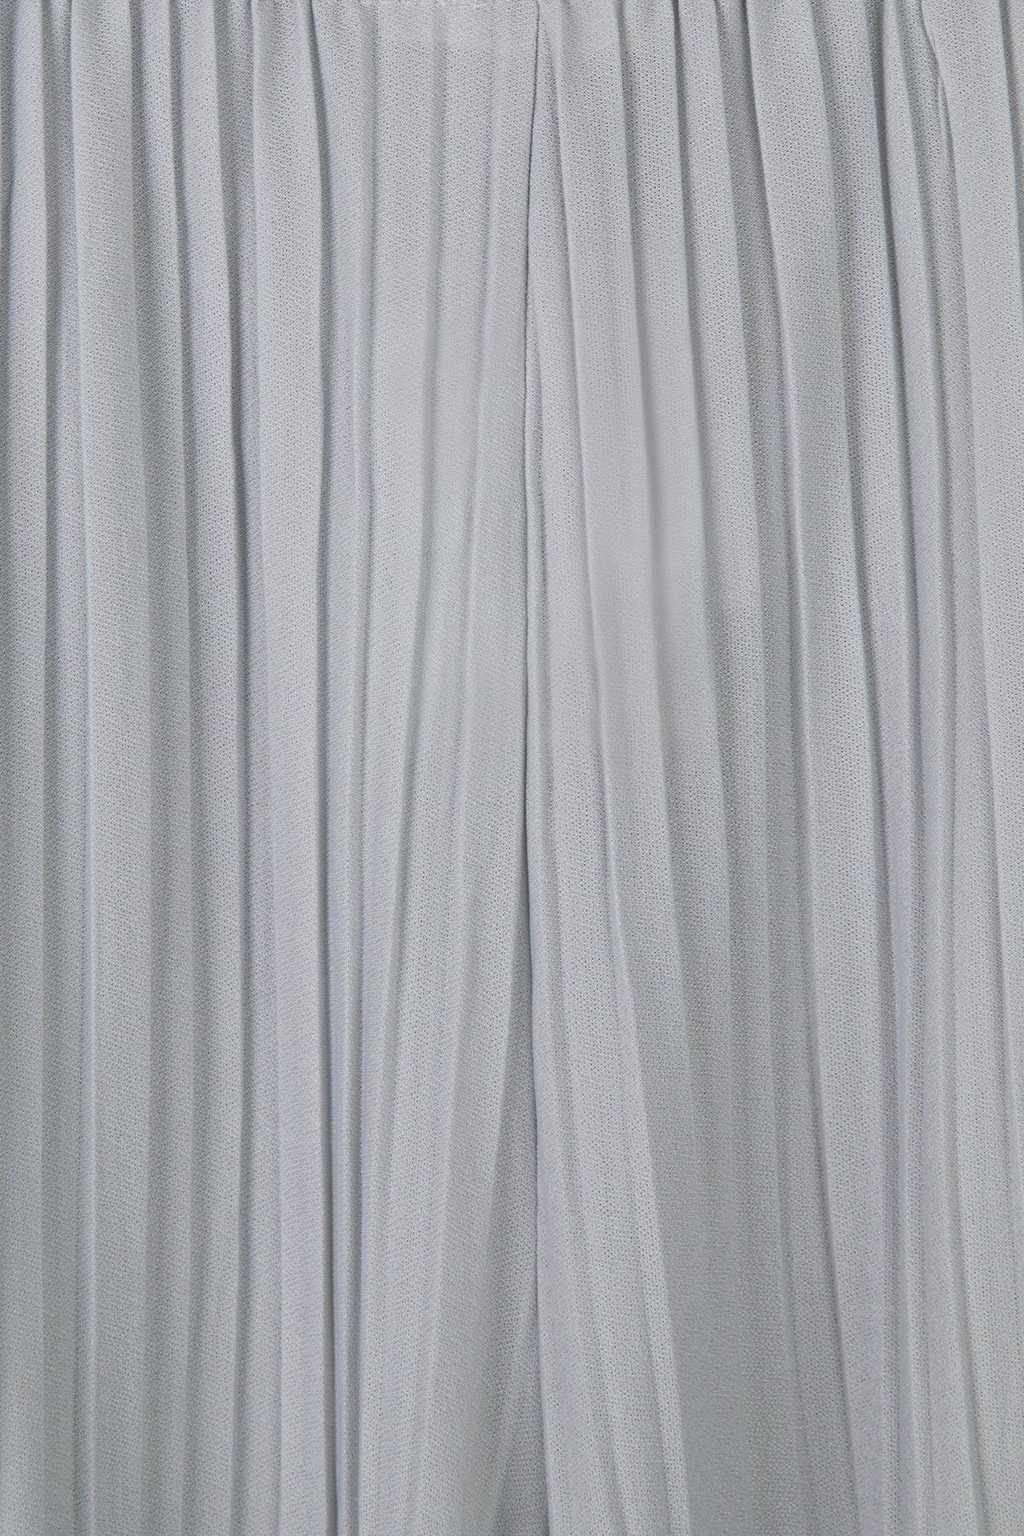 Pant K007 Gray 10